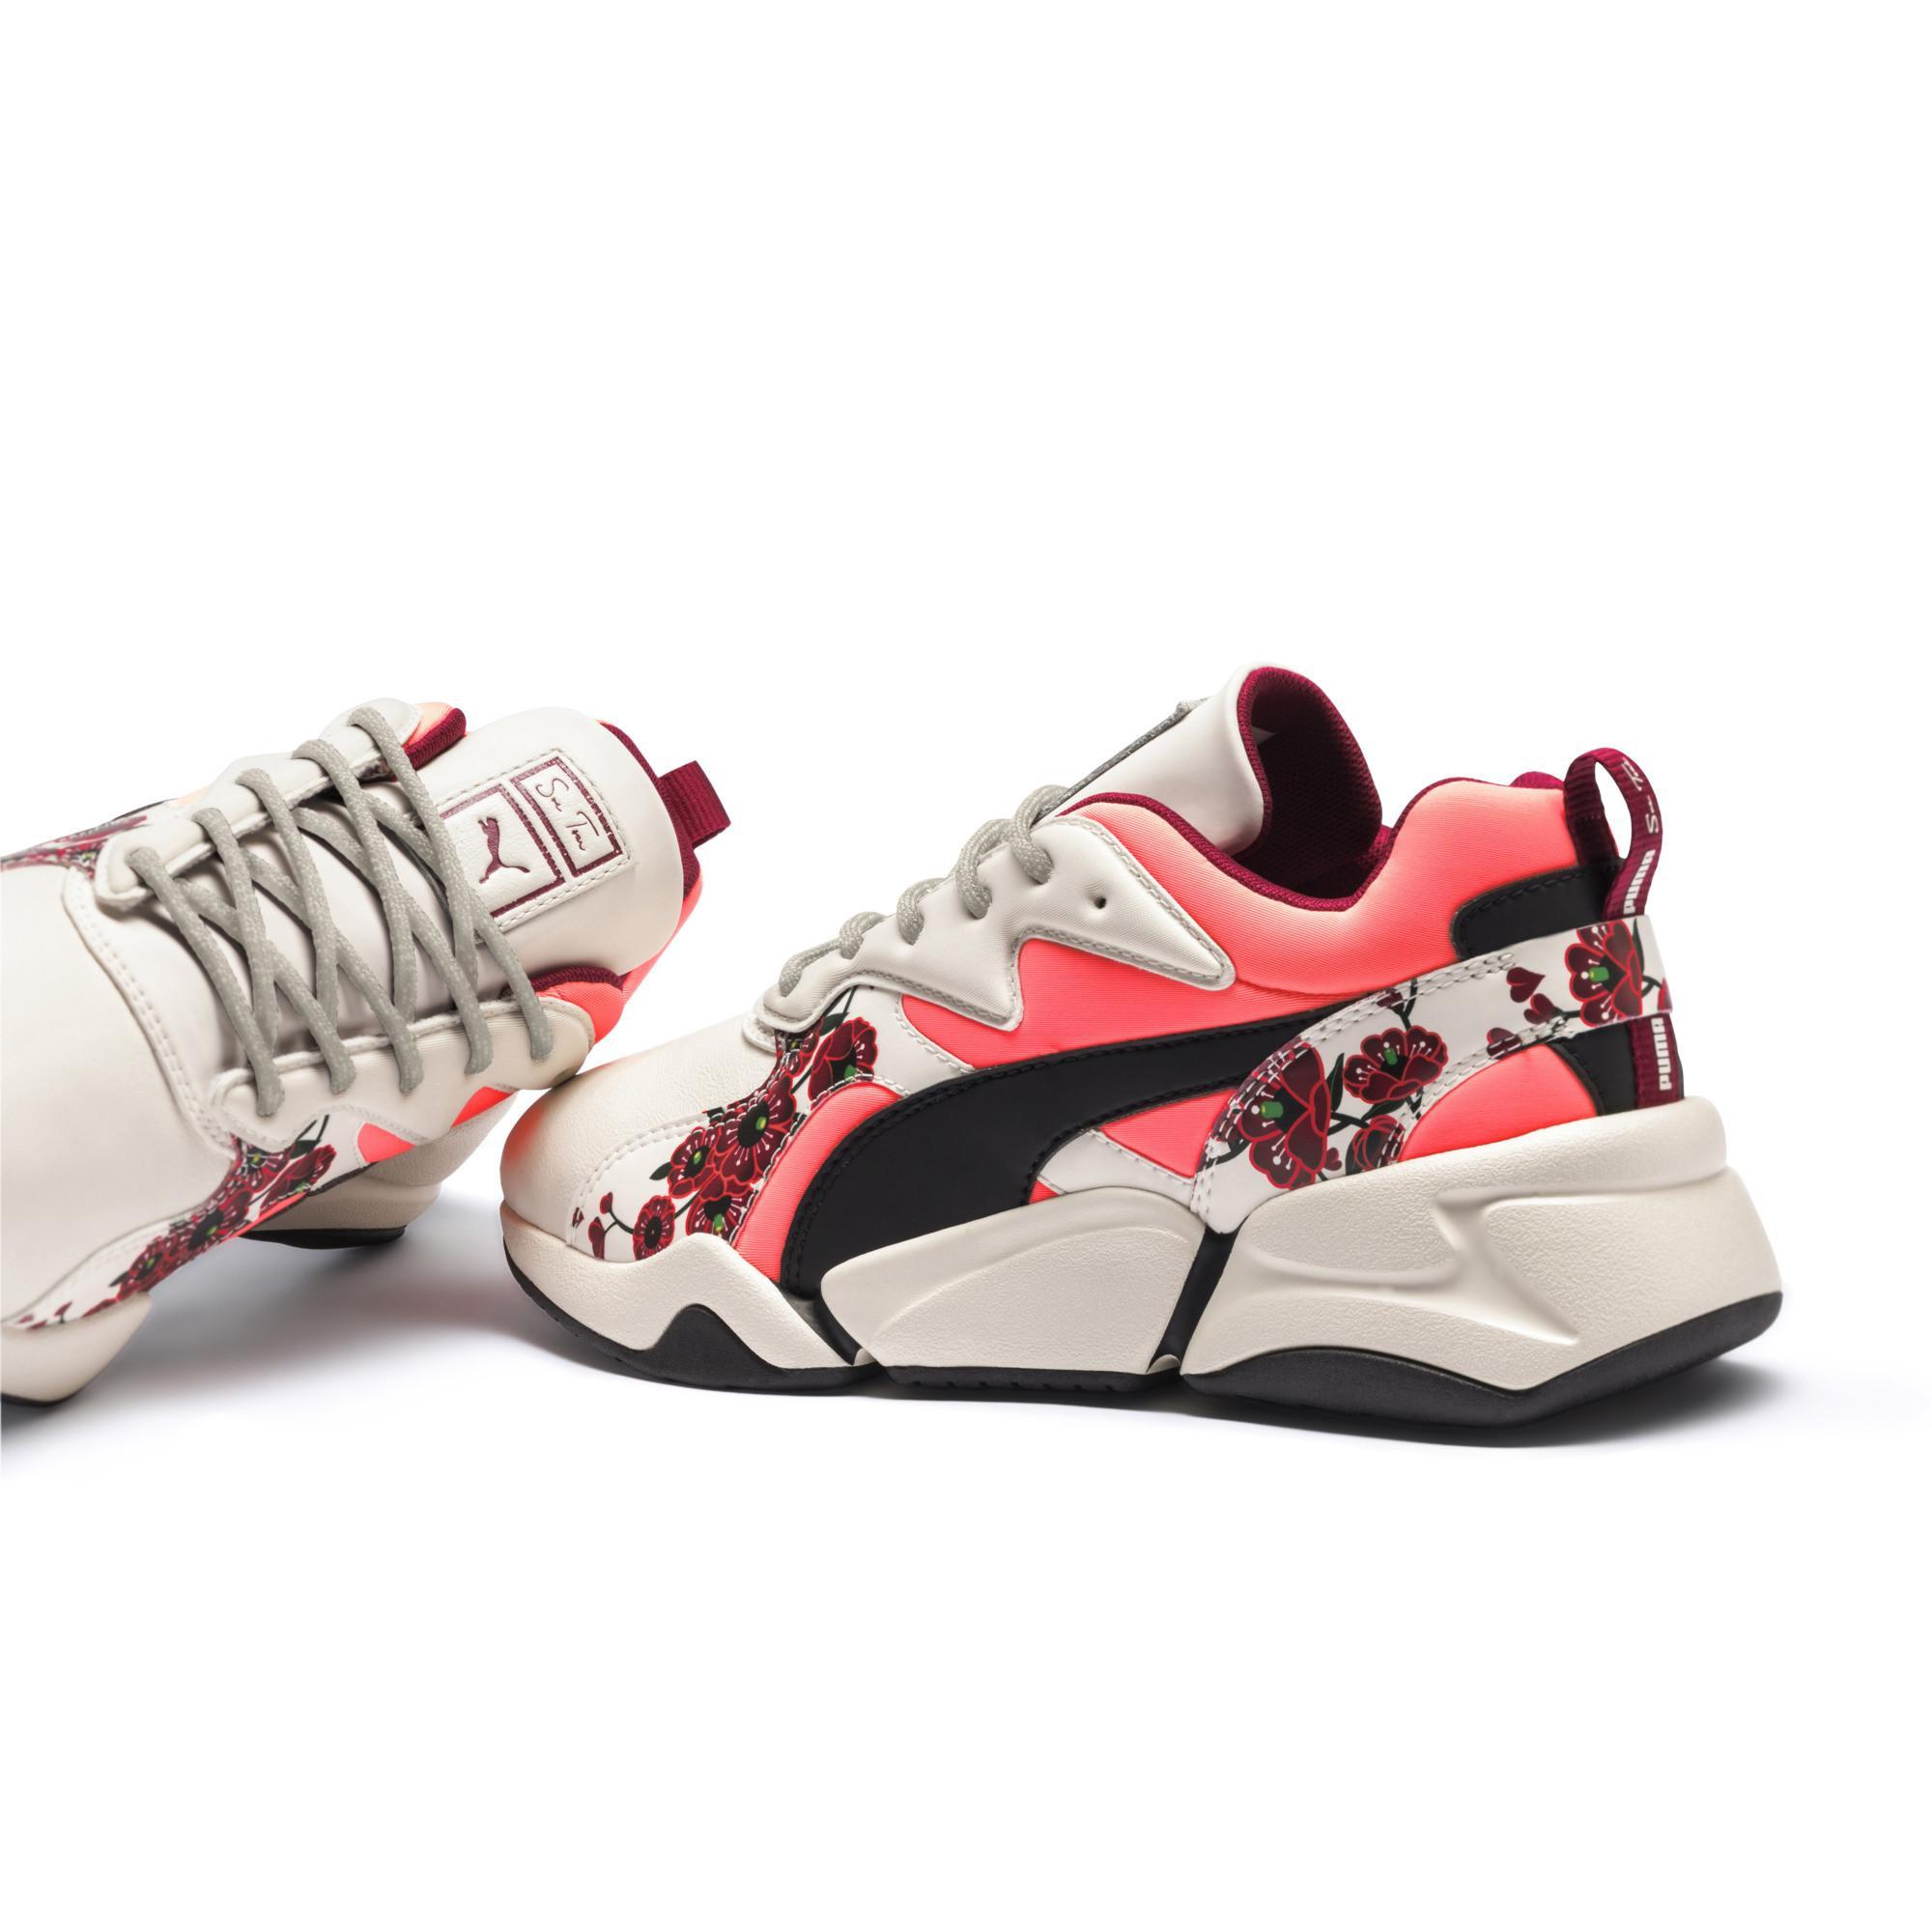 dfdd2e3b447 PUMA X Sue Tsai Nova Cherry Bombs Women's Sneakers - Lyst